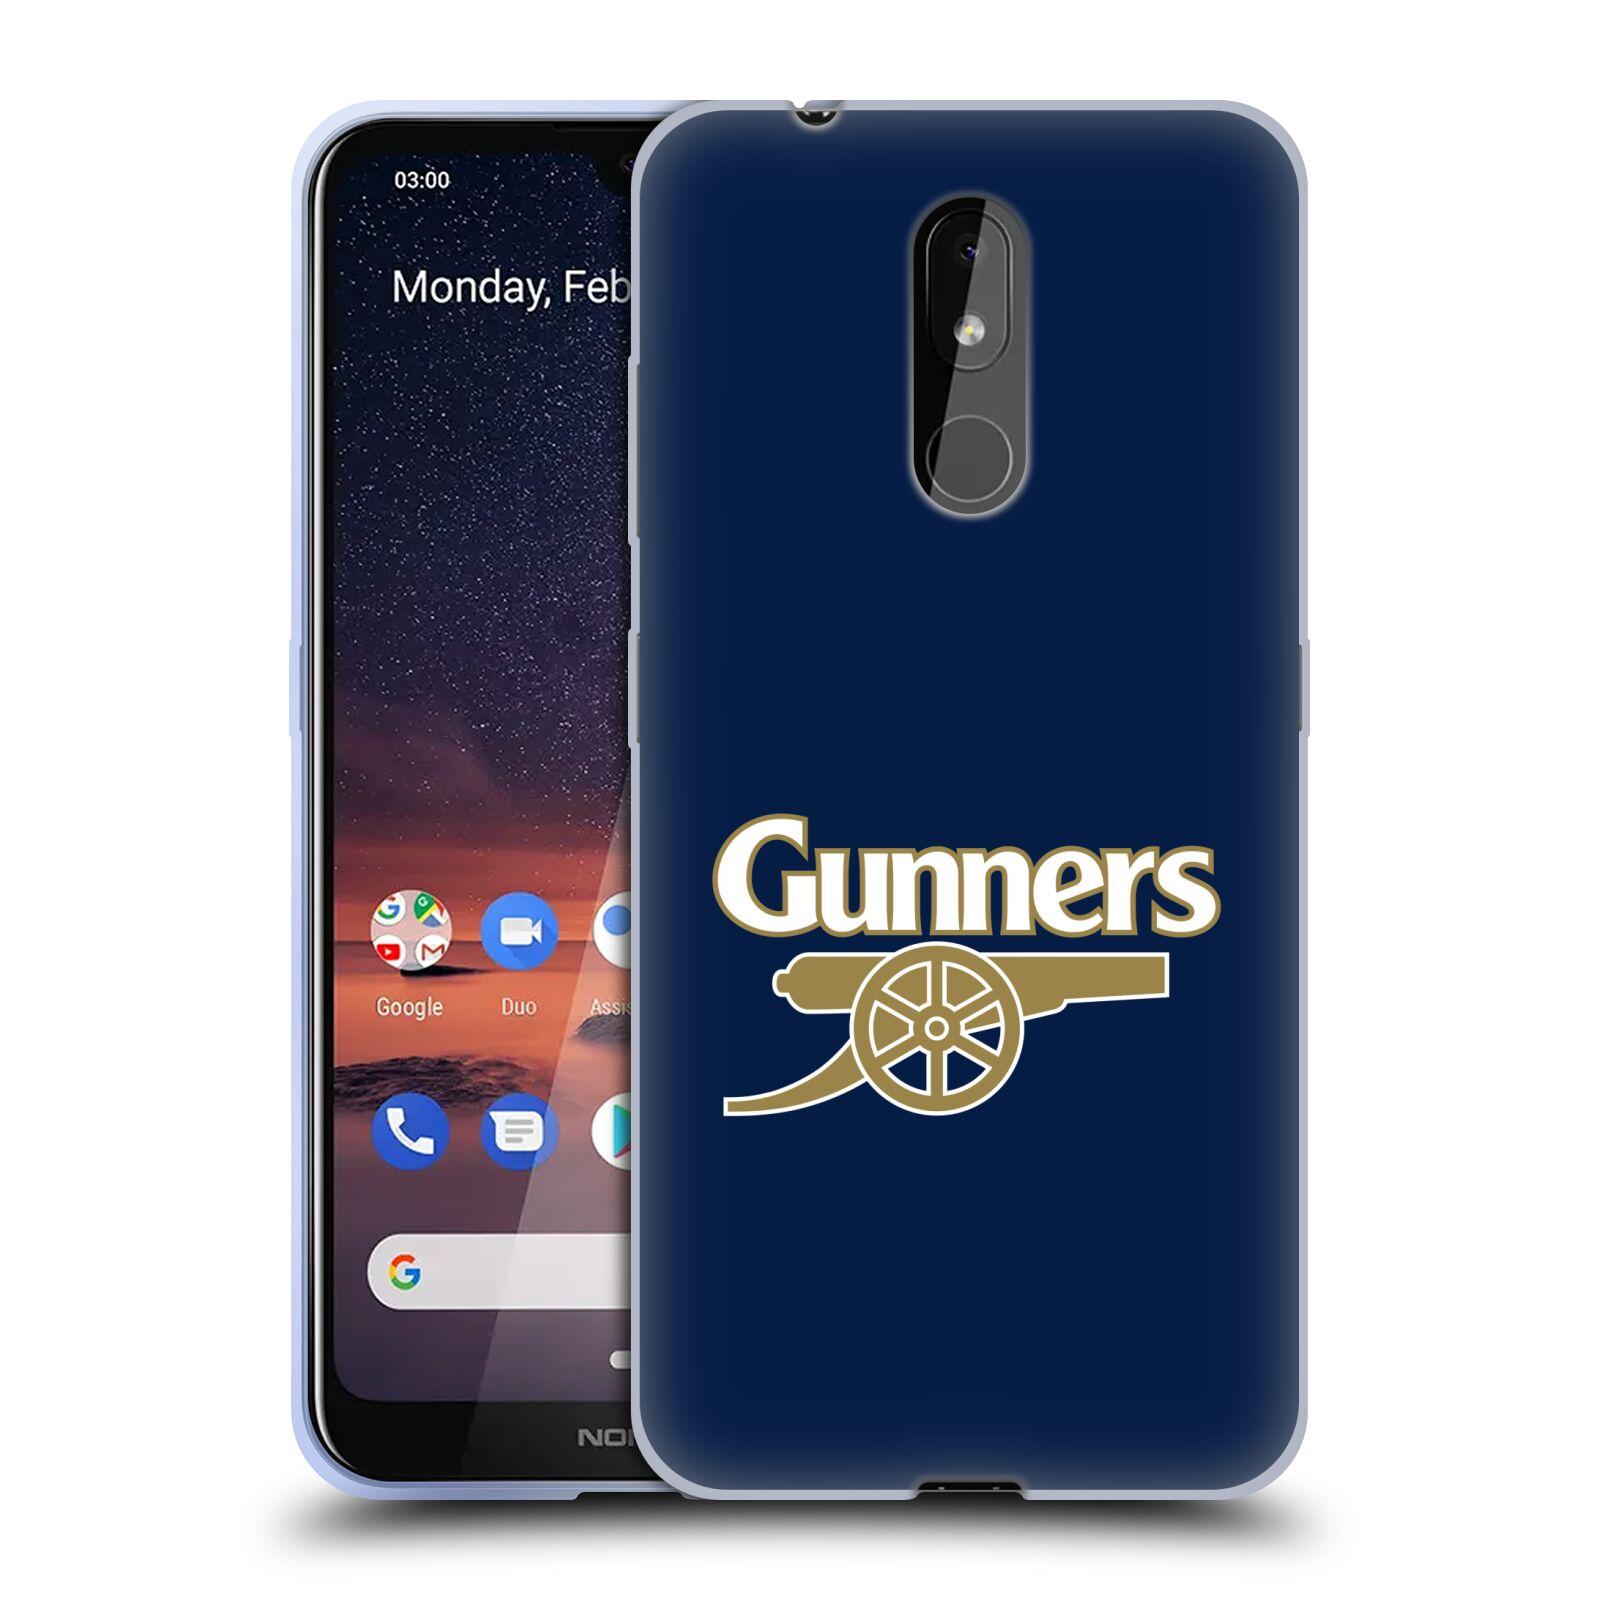 Silikonové pouzdro na mobil Nokia 3.2 - Head Case - Arsenal FC - Gunners